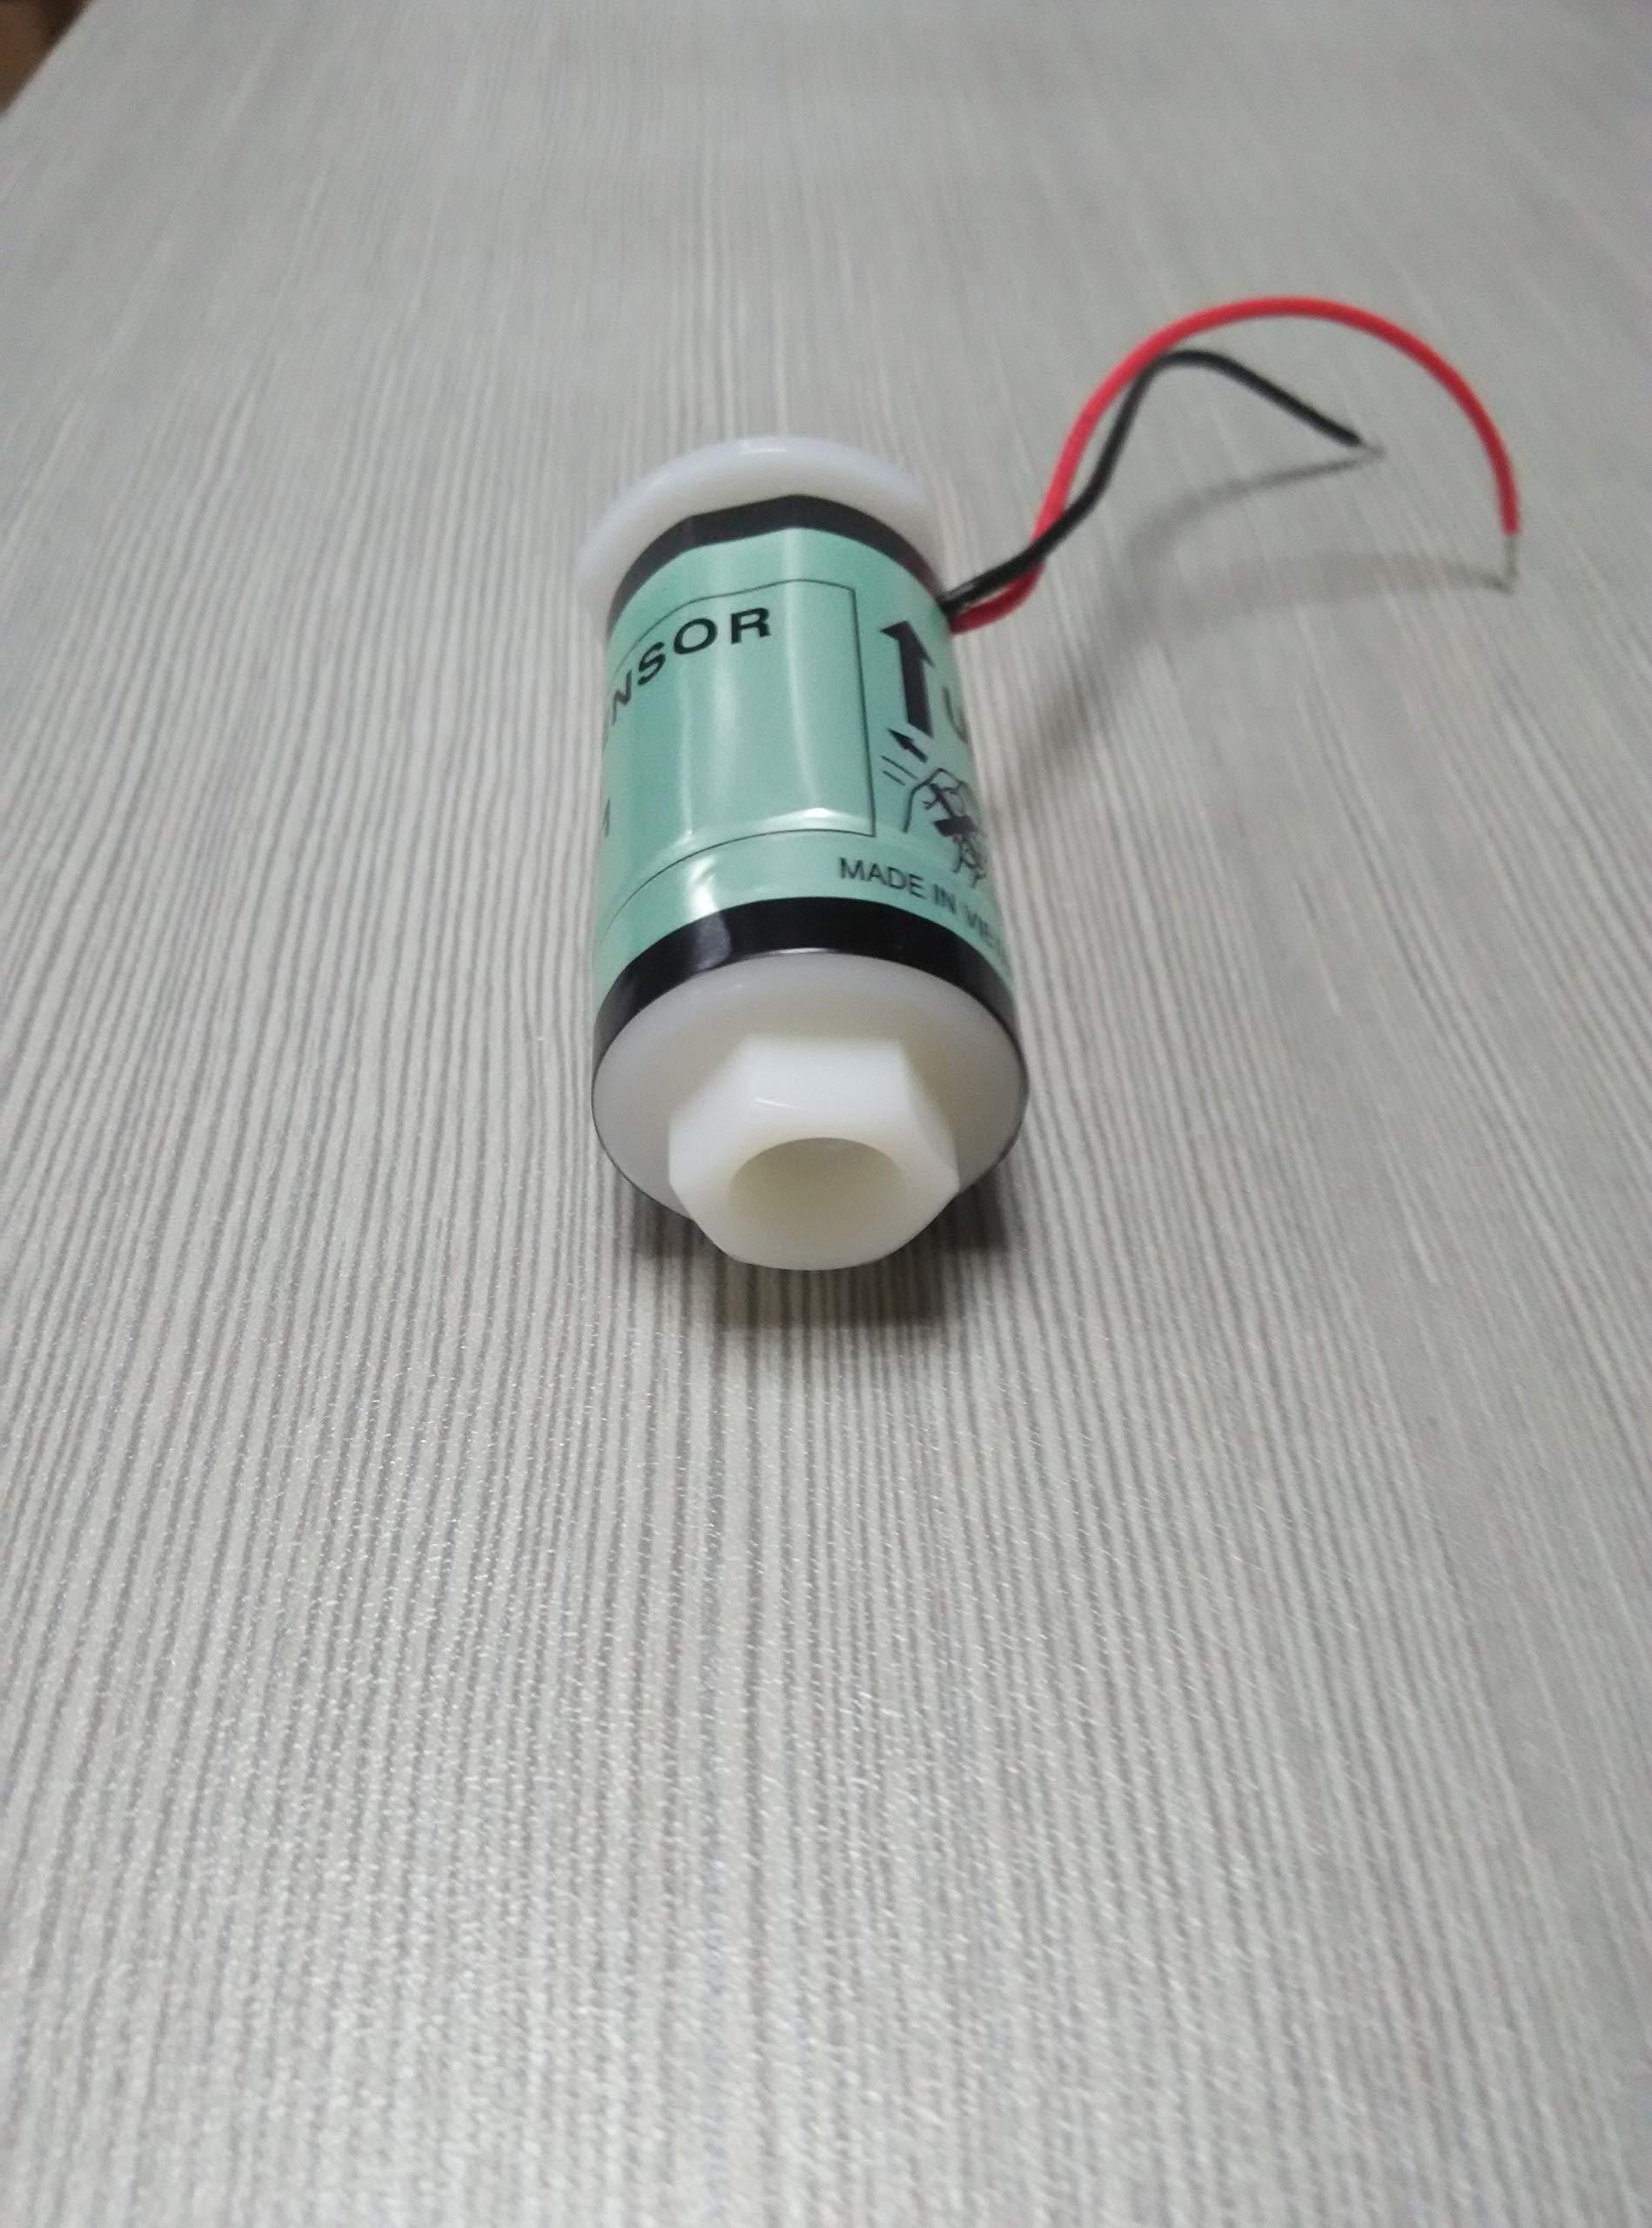 FIGARO New KE-25 KE25 Oxygen Sensor Gas Sensor Detector GSYUASA Sexangle Connector by FIGARO